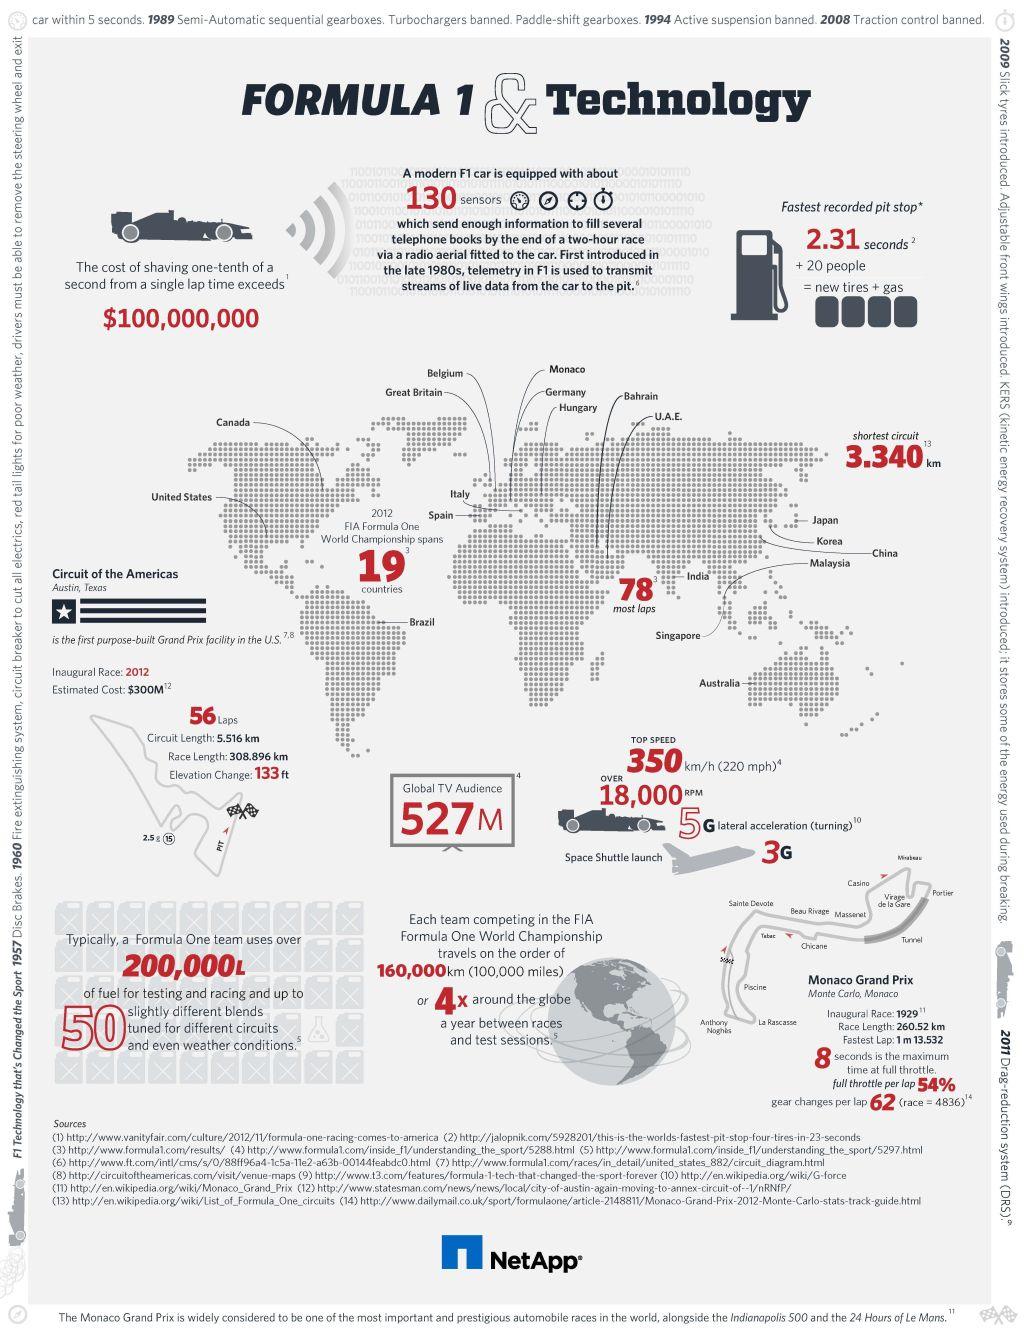 formula-1-big-data-infographic-netapp1